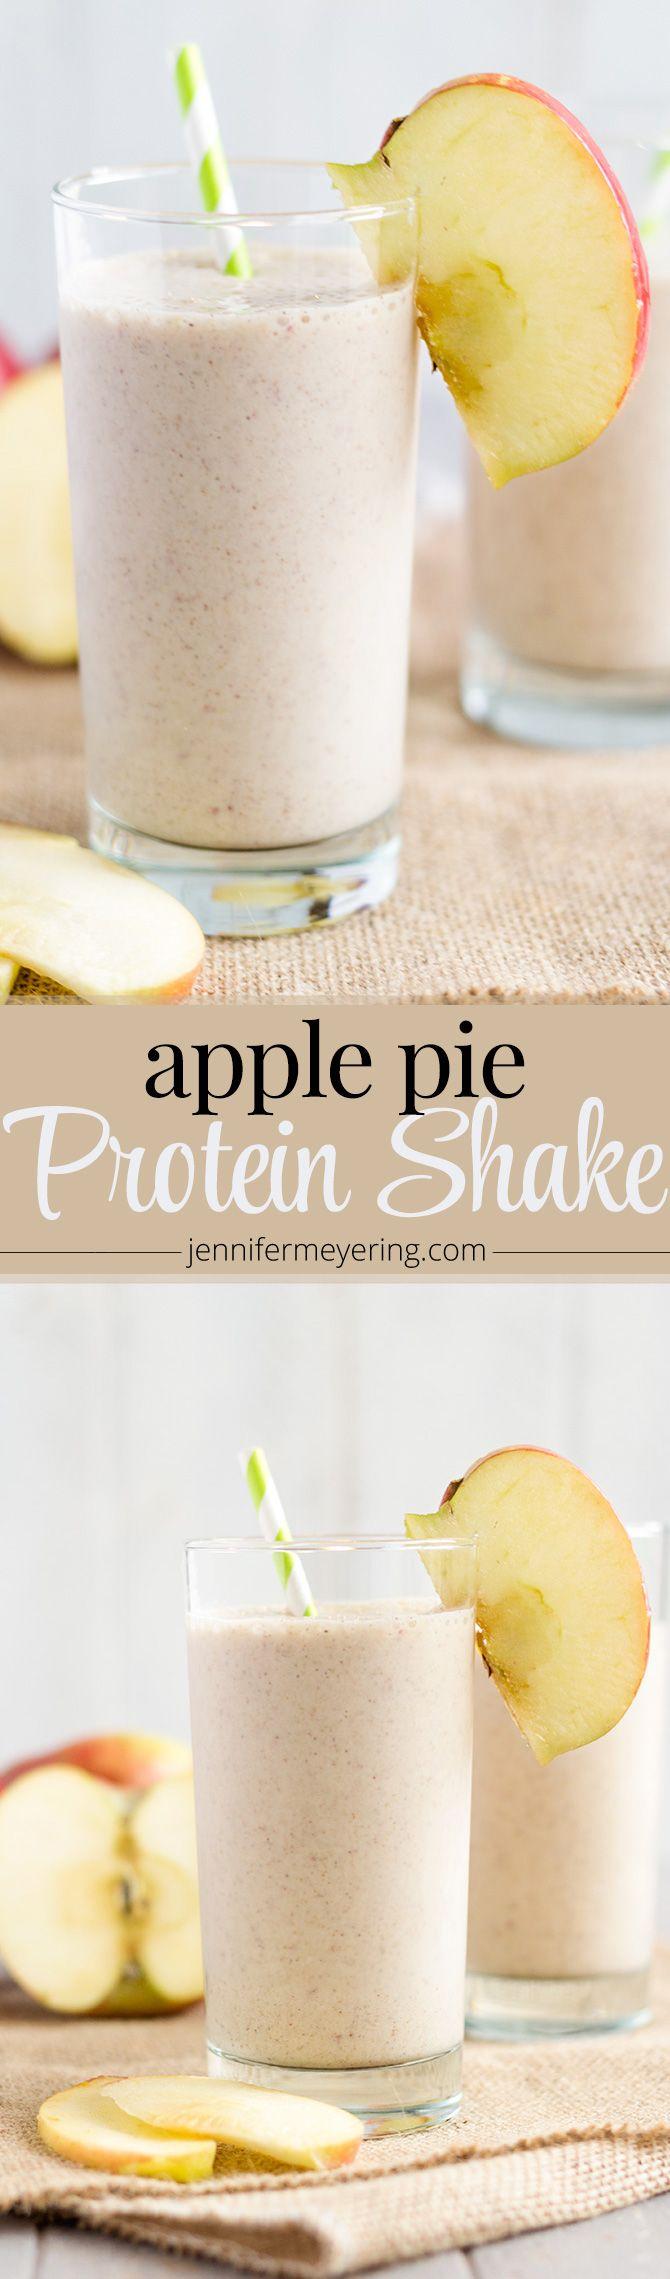 Apple Pie Protein Smoothie   JenniferMeyering.com                                                                                                                                                                                 More